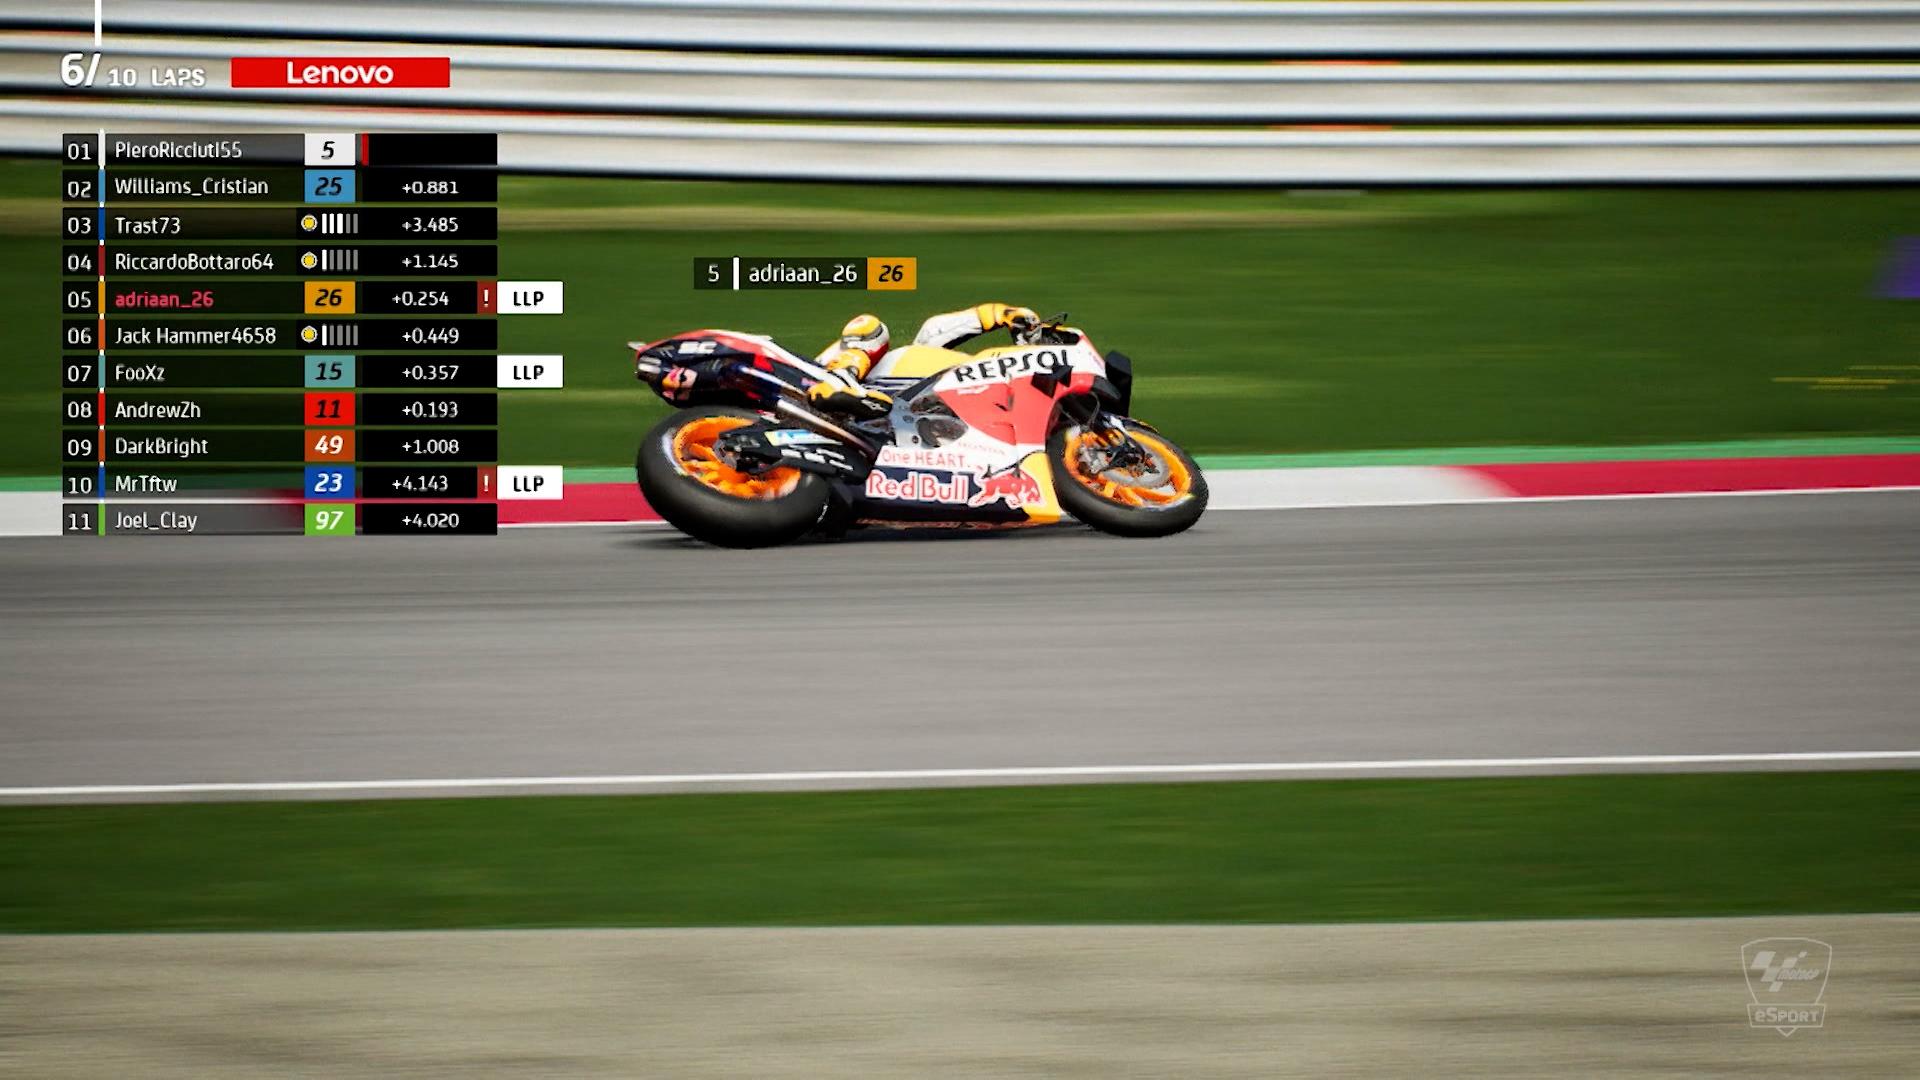 2021_MotoGP_00_GS2_eSPORTS_GLOBALSERIES_ROUND_02_PGM.00_45_53_07.Imagen-fija006